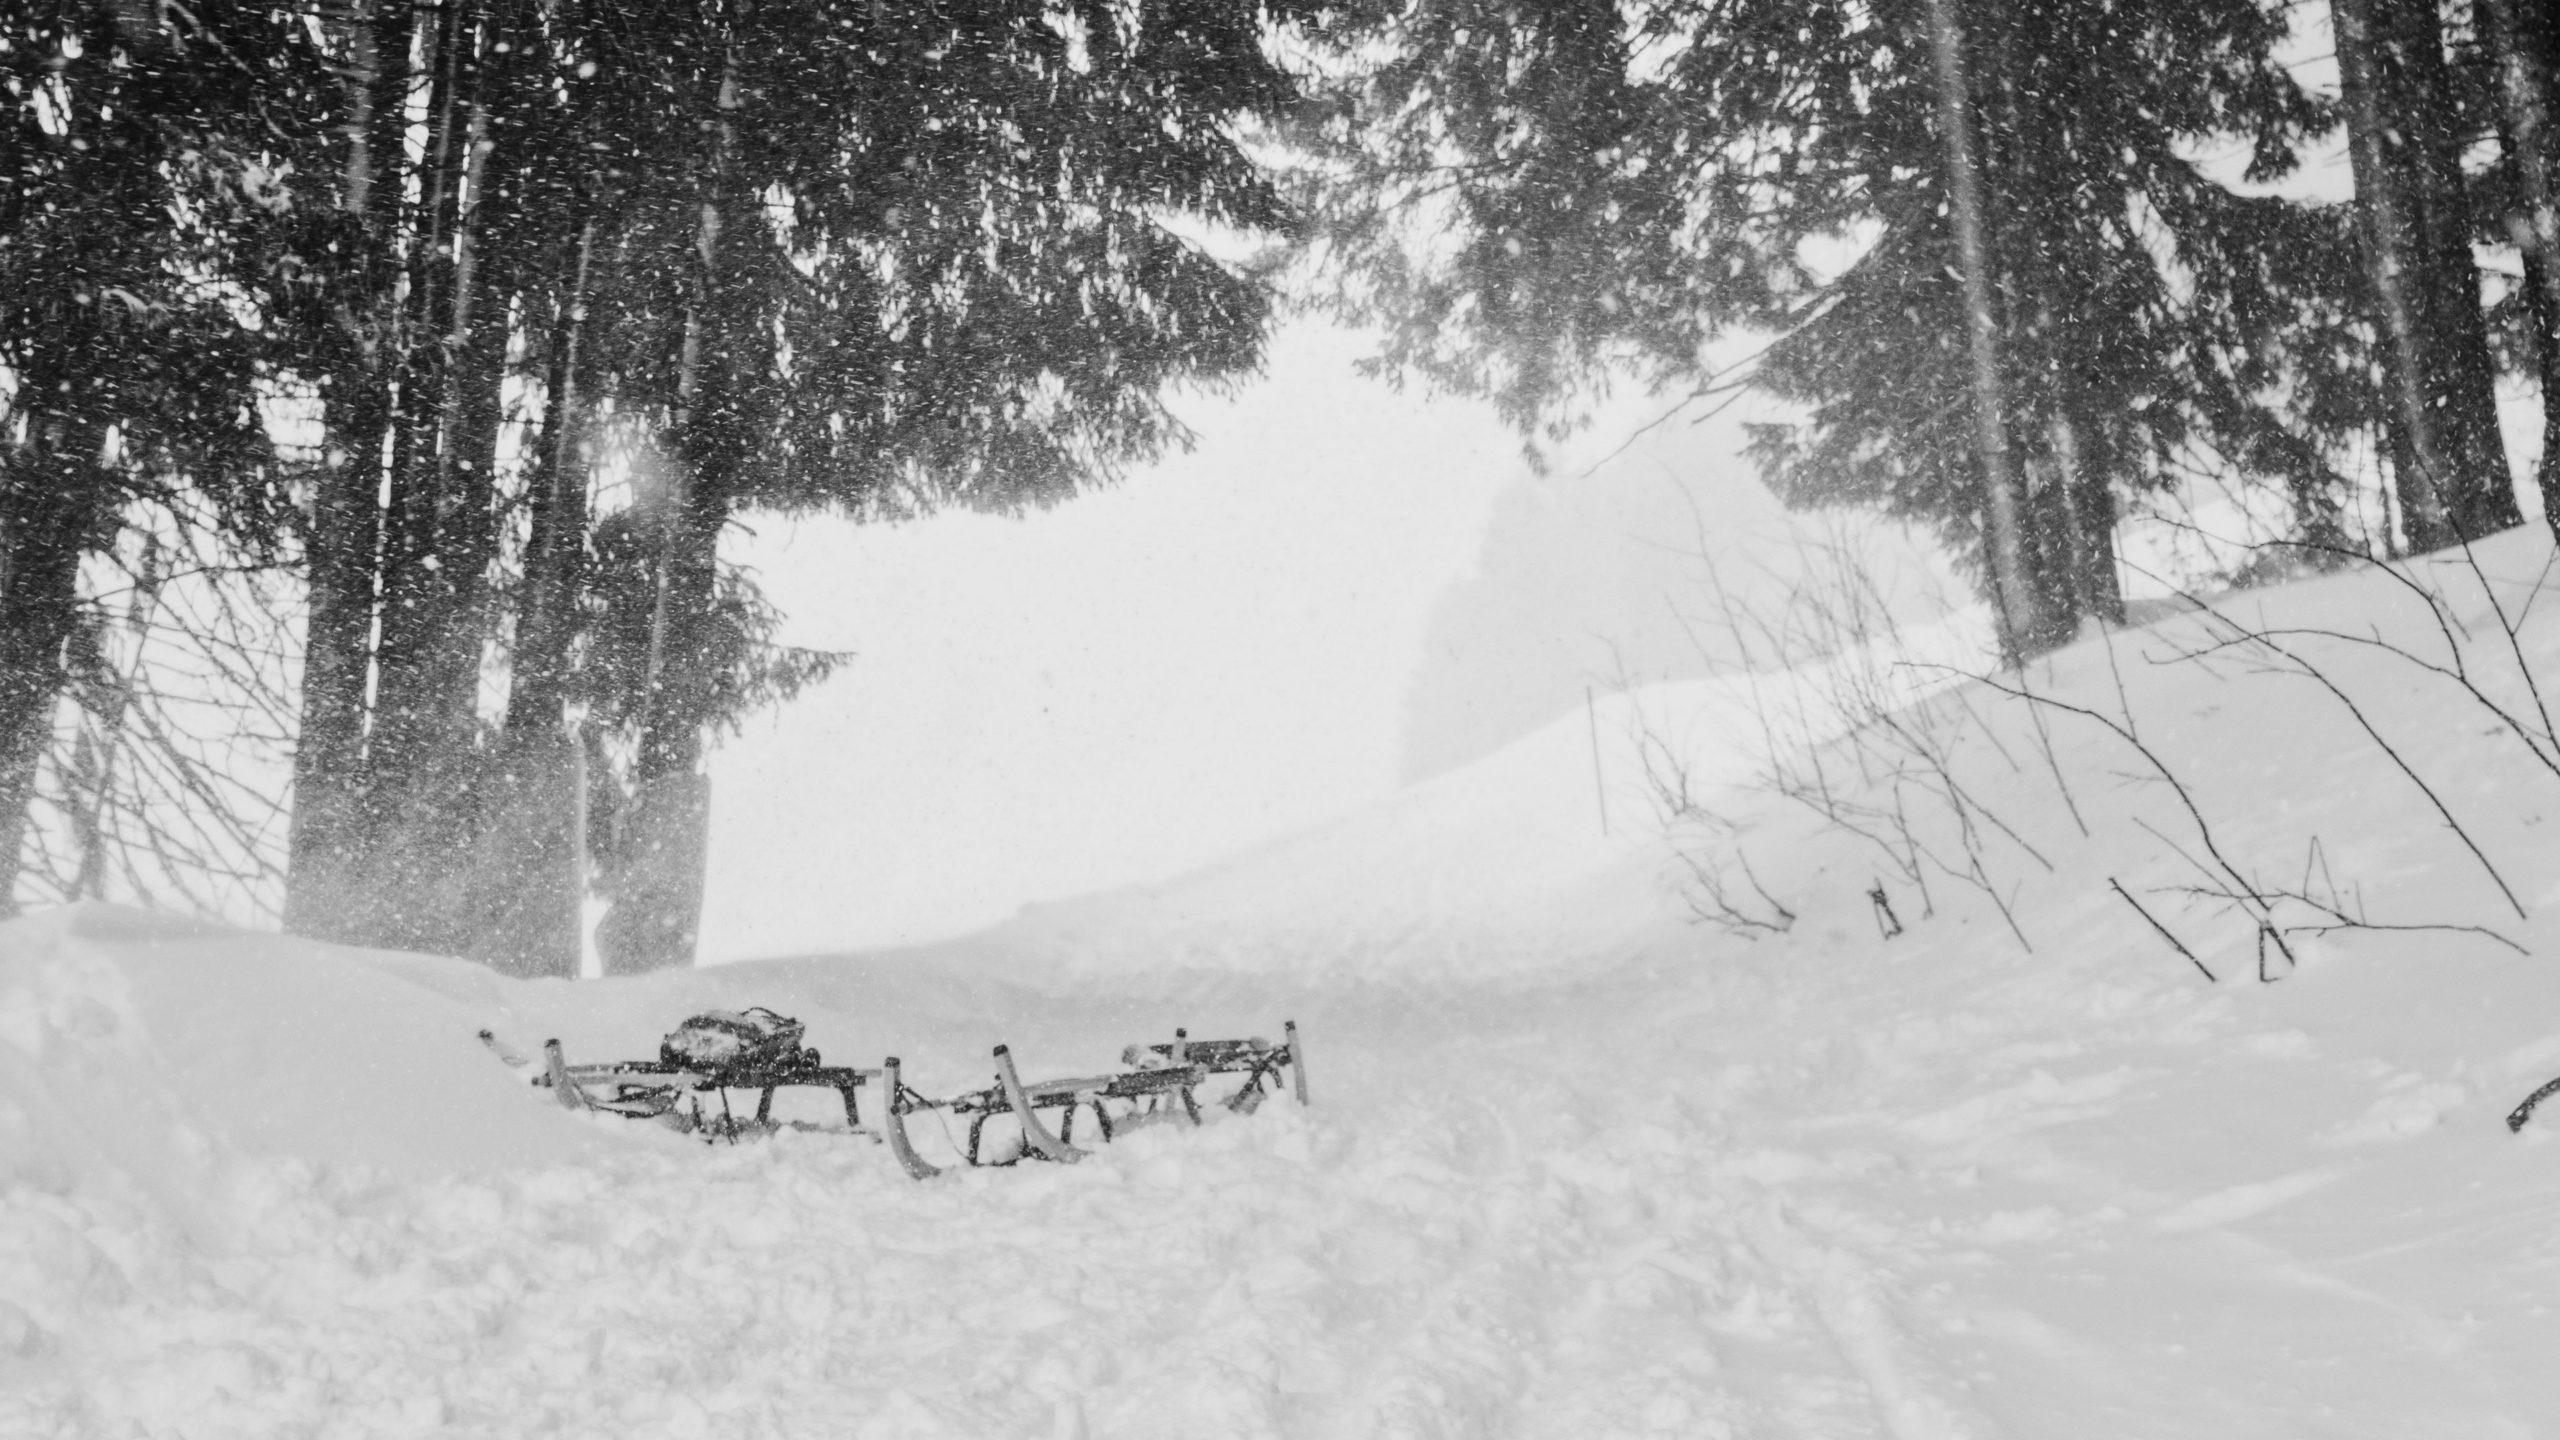 pics of snowfall